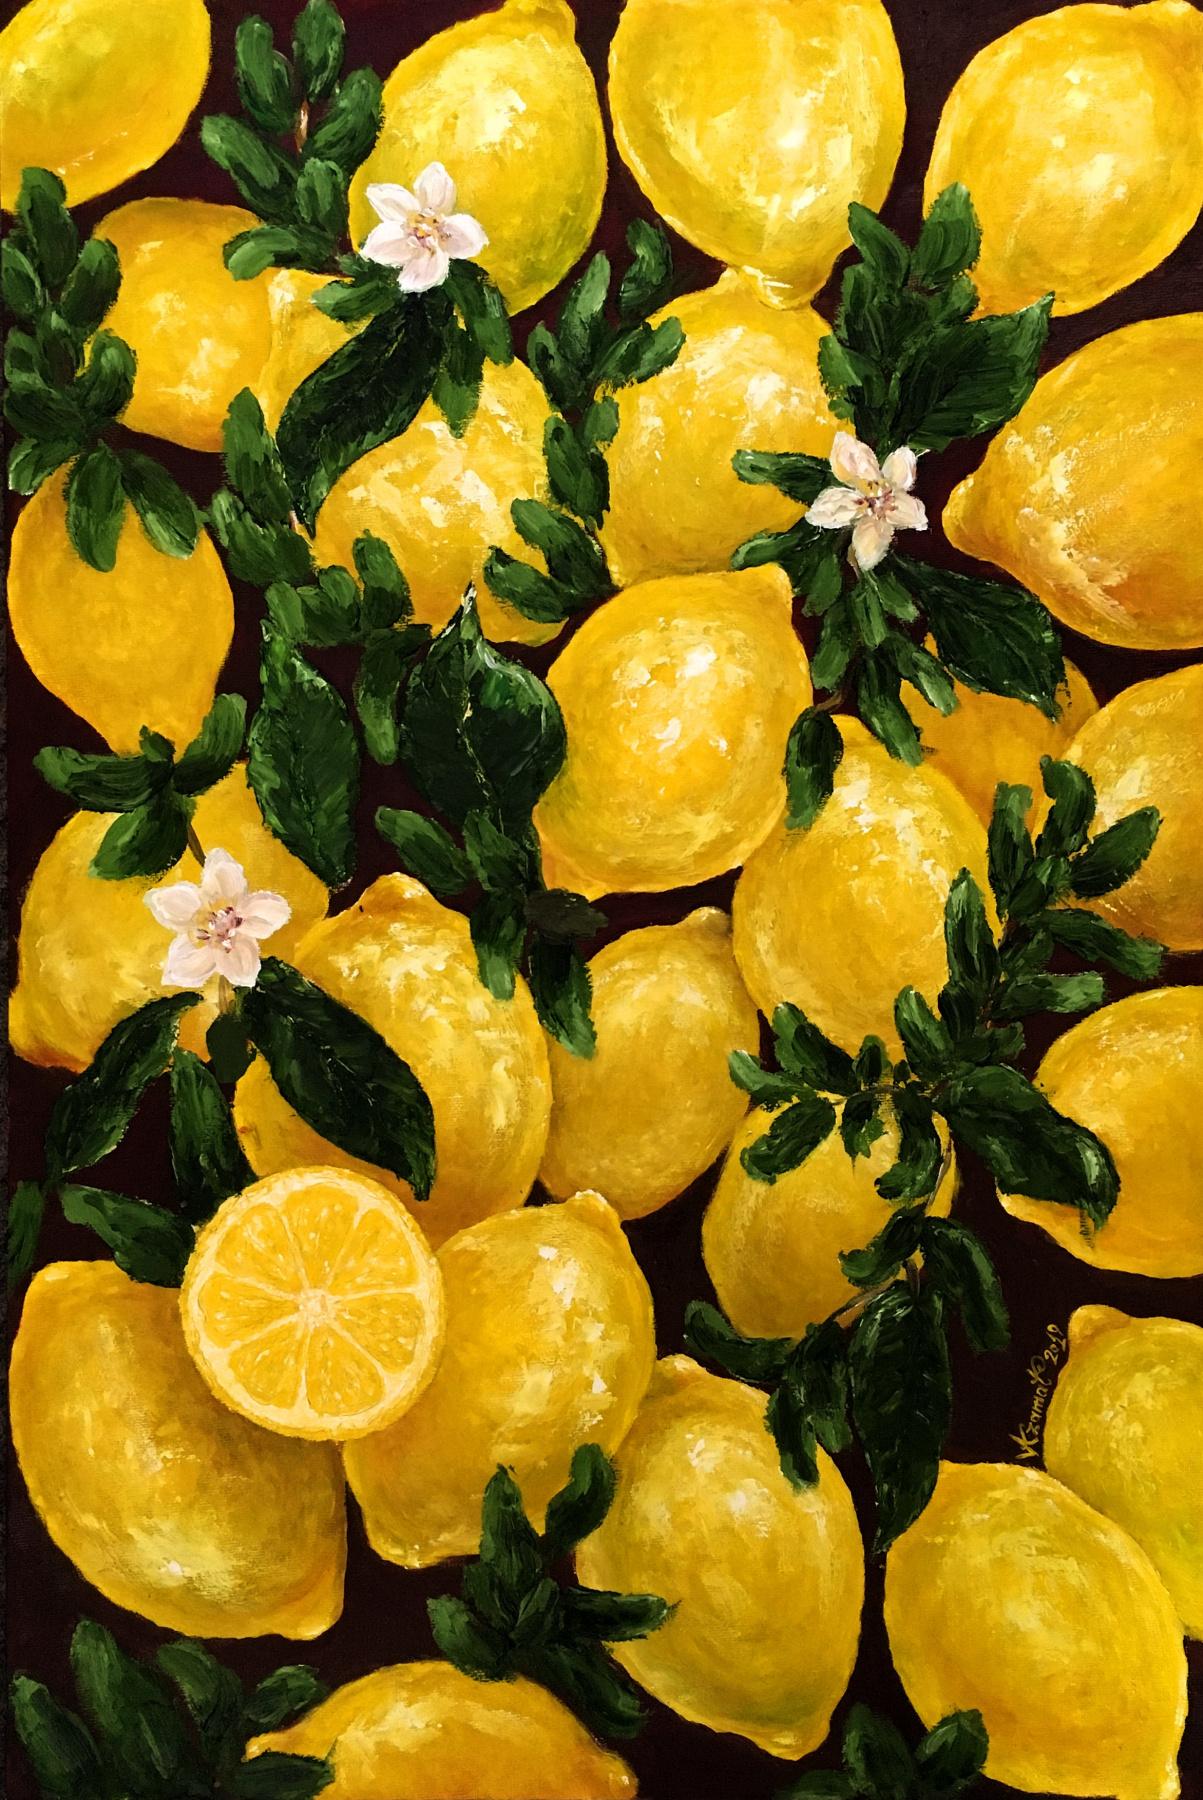 Valerika Azamat. Lemon mood